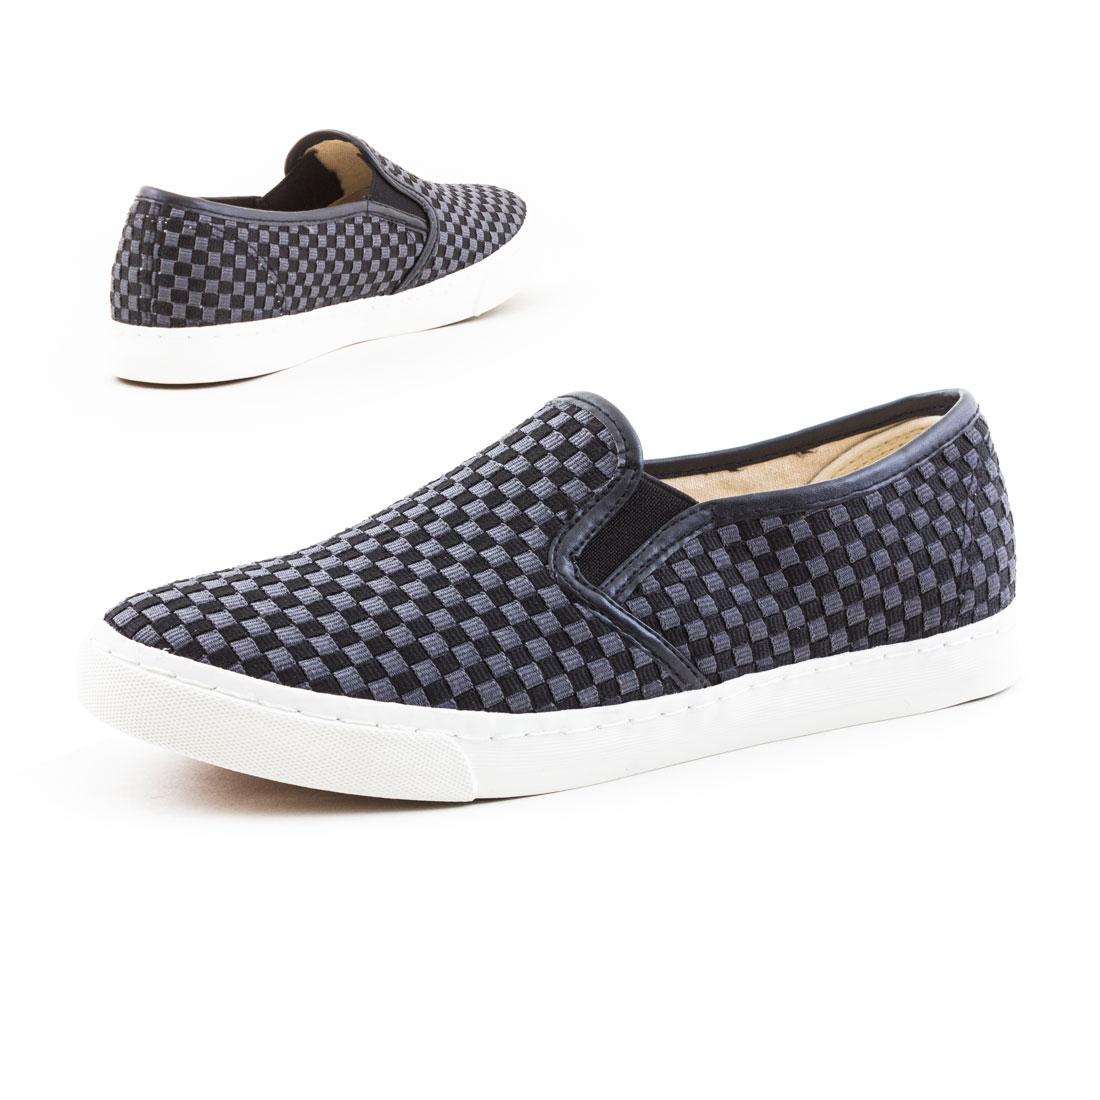 neu damen sneaker slipper canvas sport sommer schuhe gr 36 37 38 39 40 41 ebay. Black Bedroom Furniture Sets. Home Design Ideas